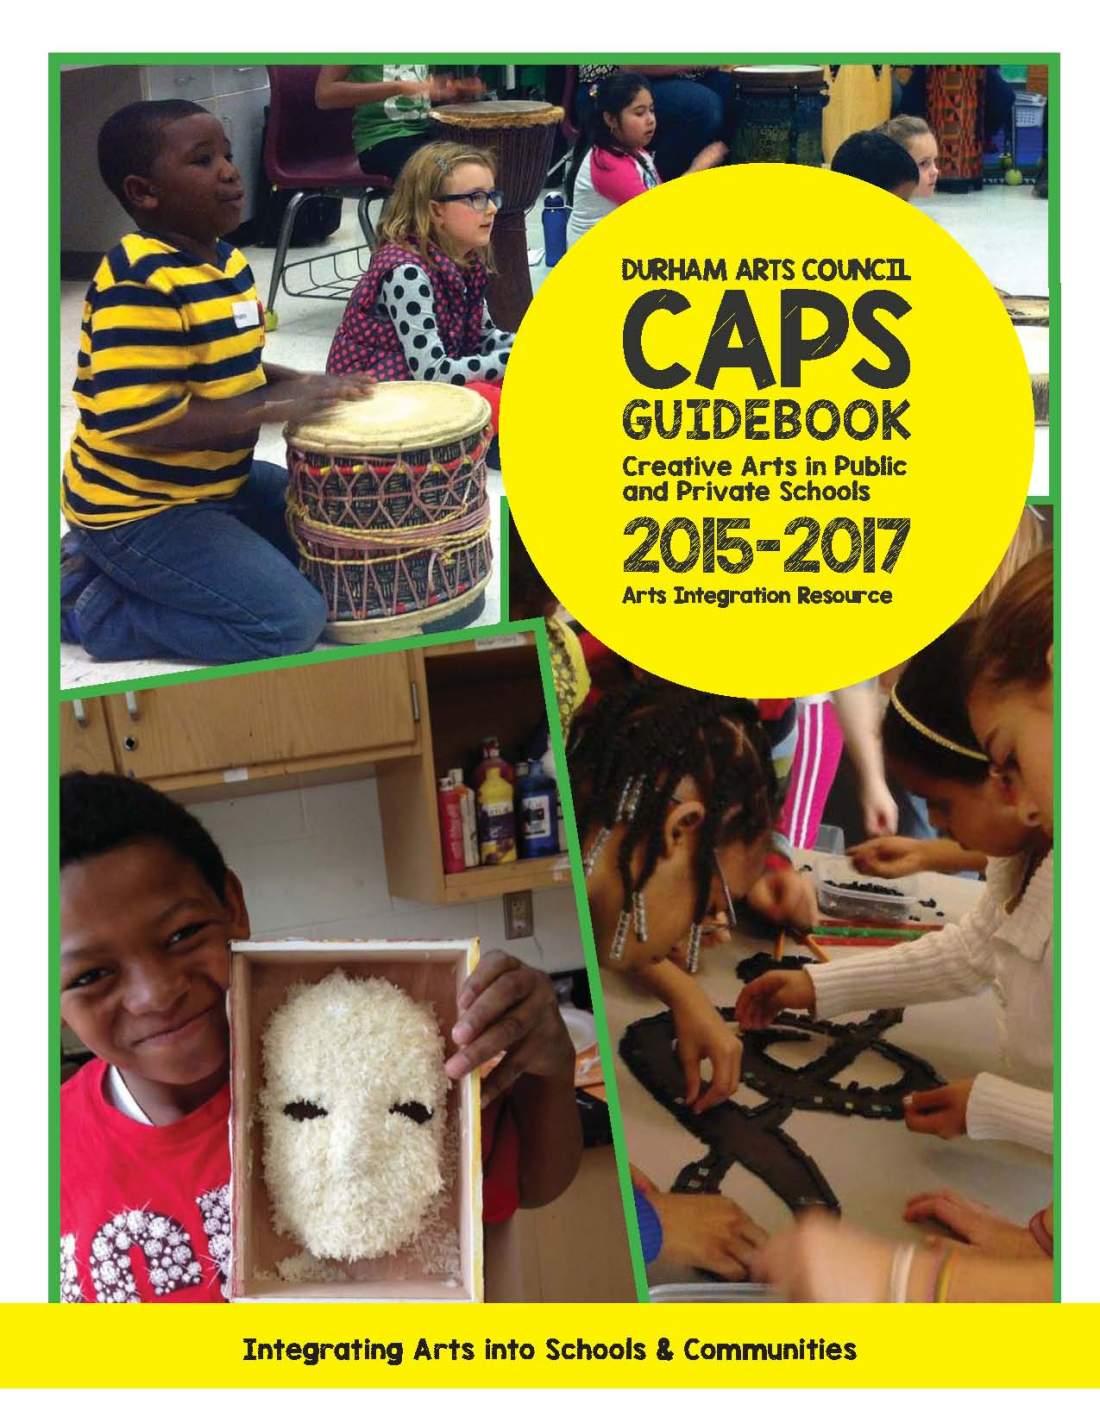 2015-17 Guidebook Cover